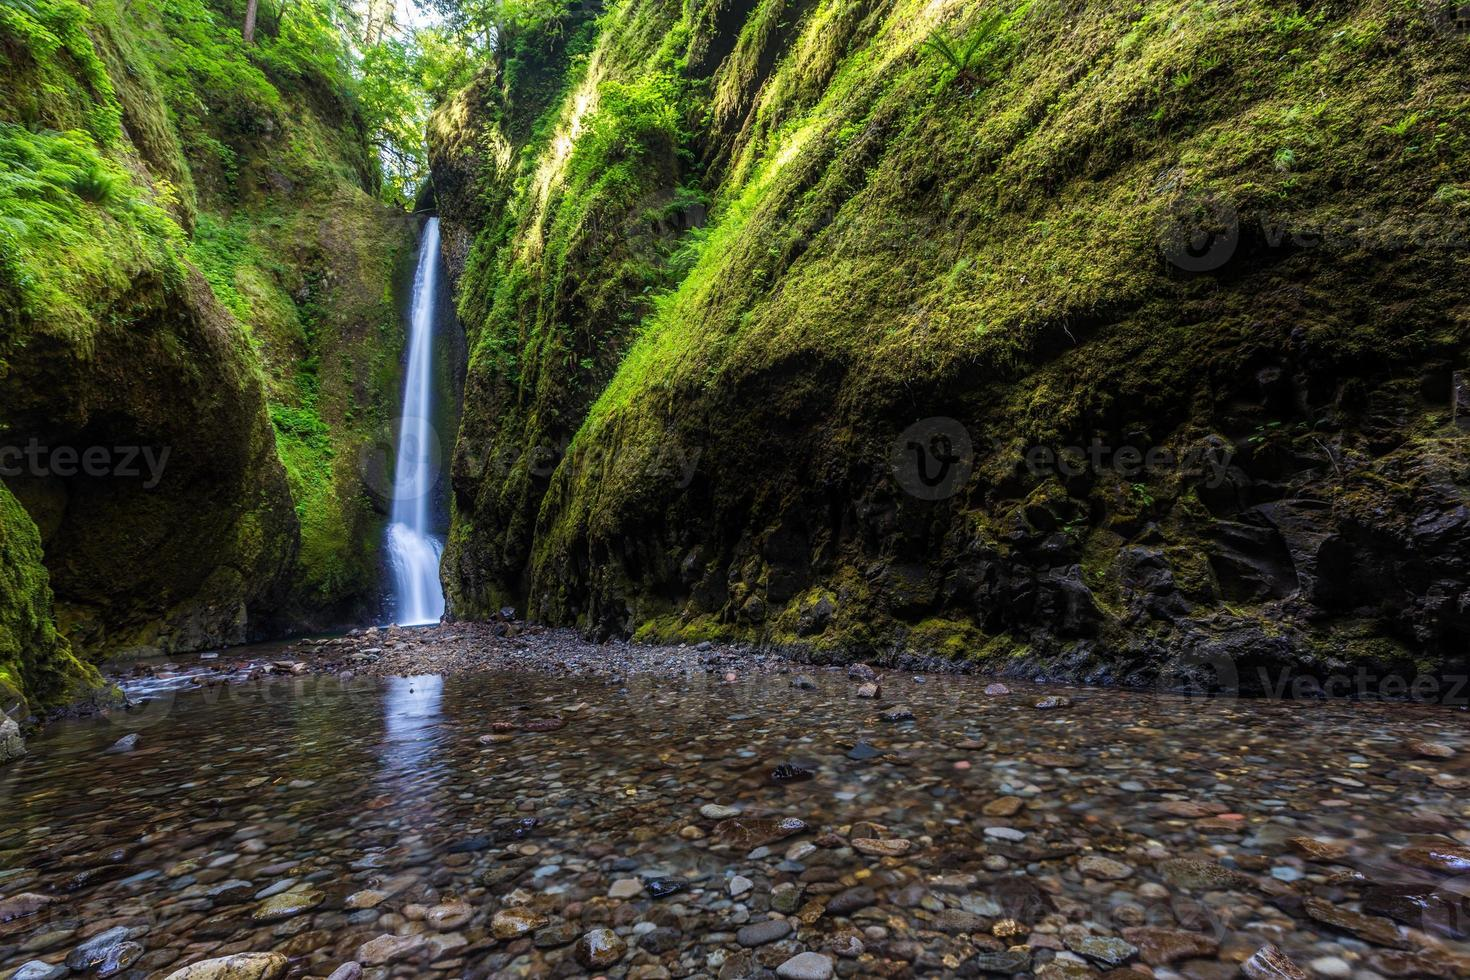 Wunderschöne Natur in Oneonta Gorge Trail, Oregon foto